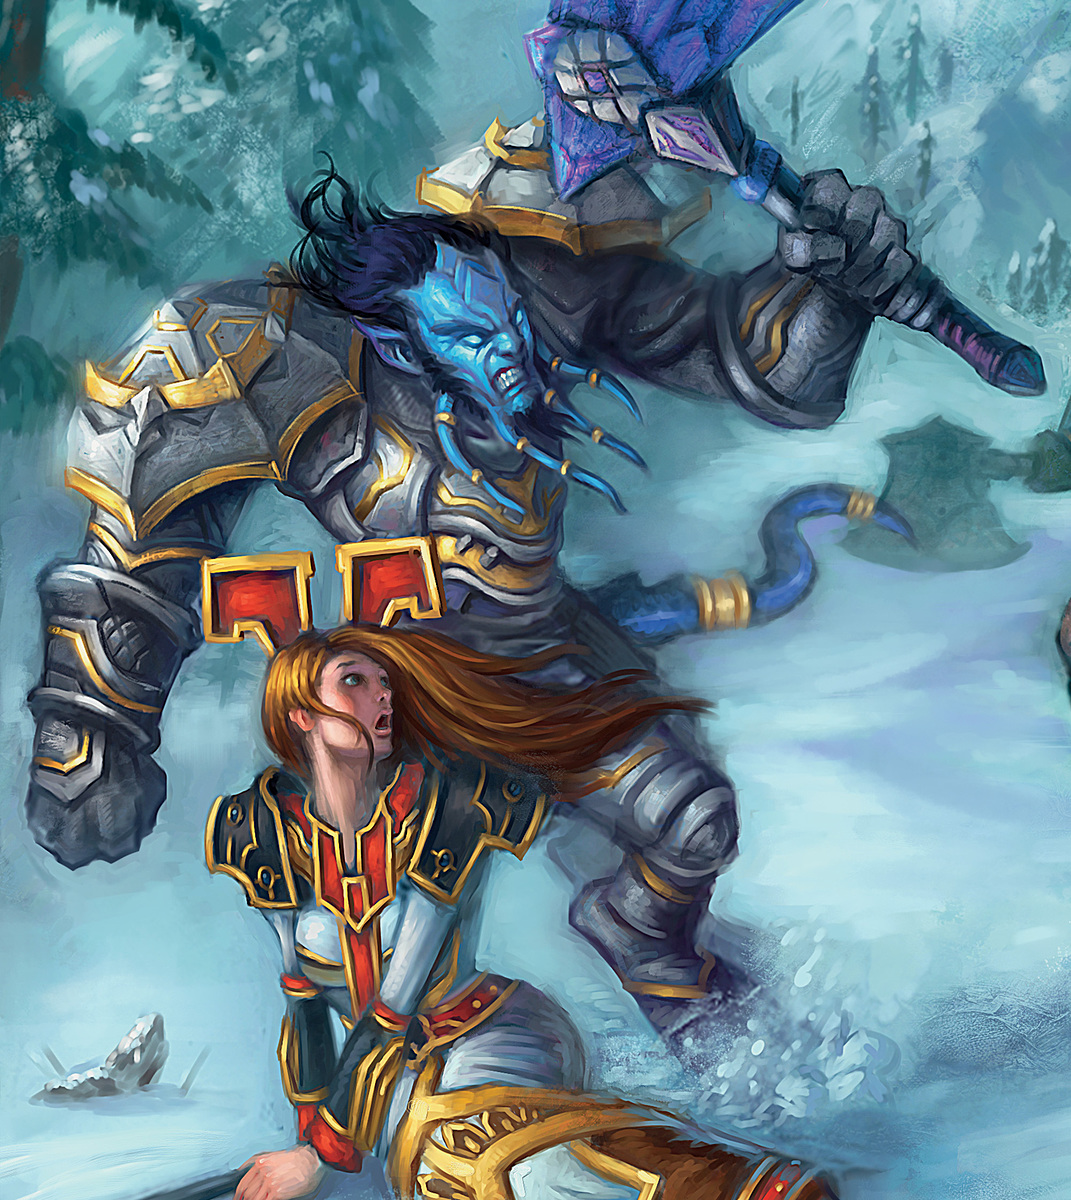 Art: Realm First Achievements, Battle.Net App Chat, Blue Tweets